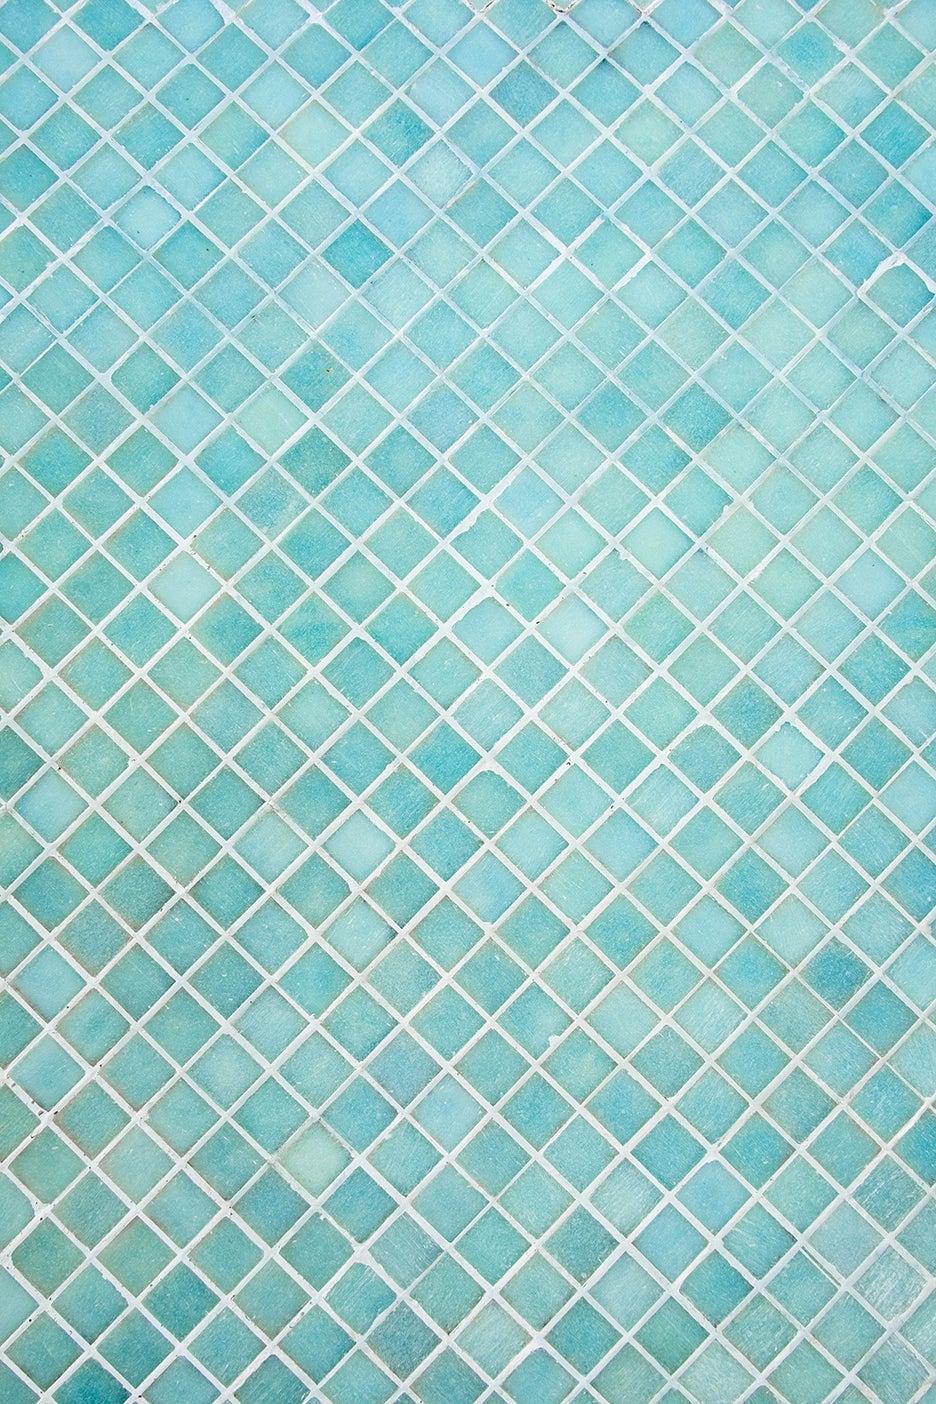 Pattern of blue square mosaic